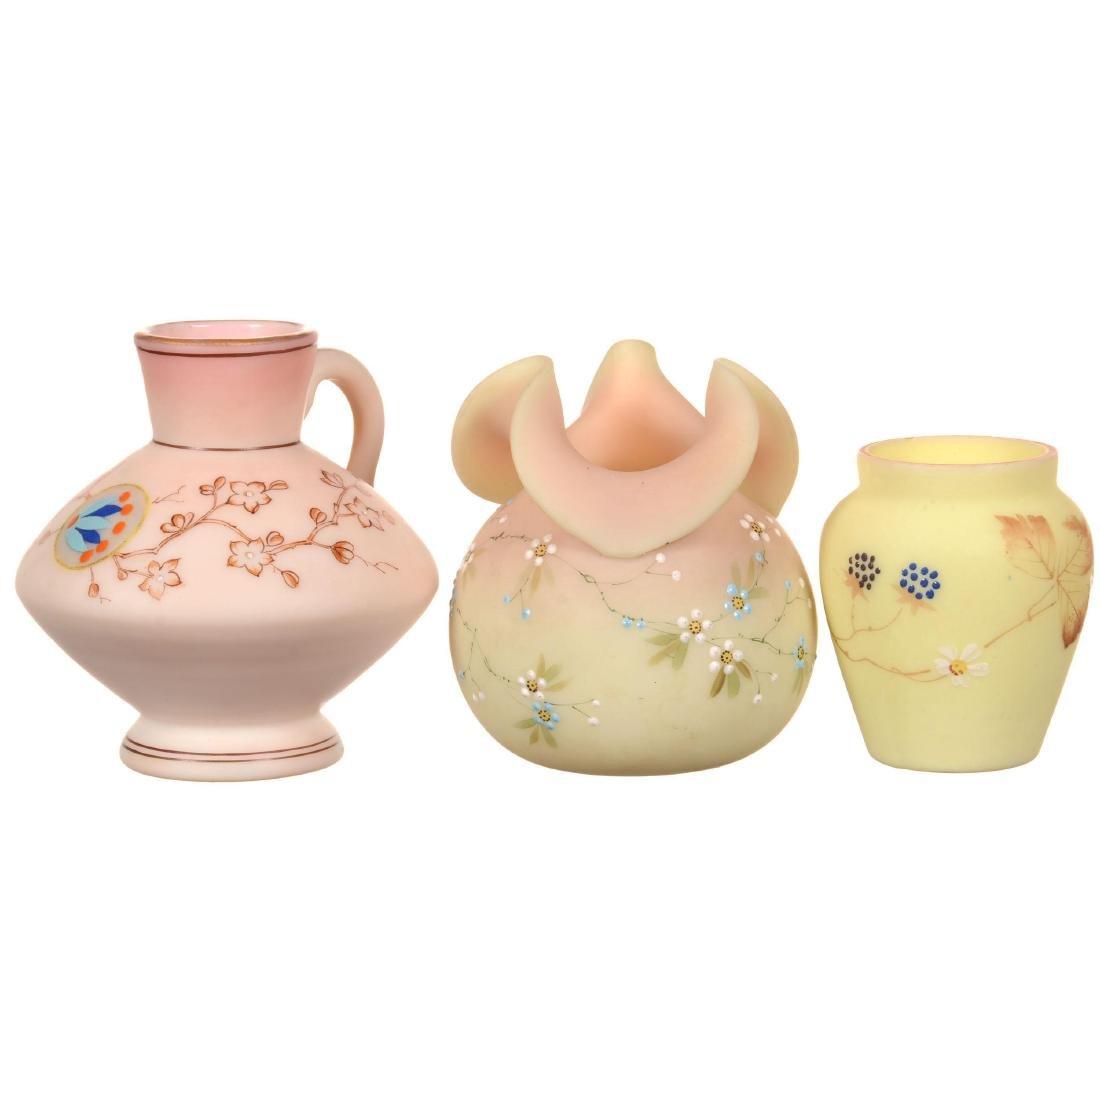 (3) Decorated Burmese Items